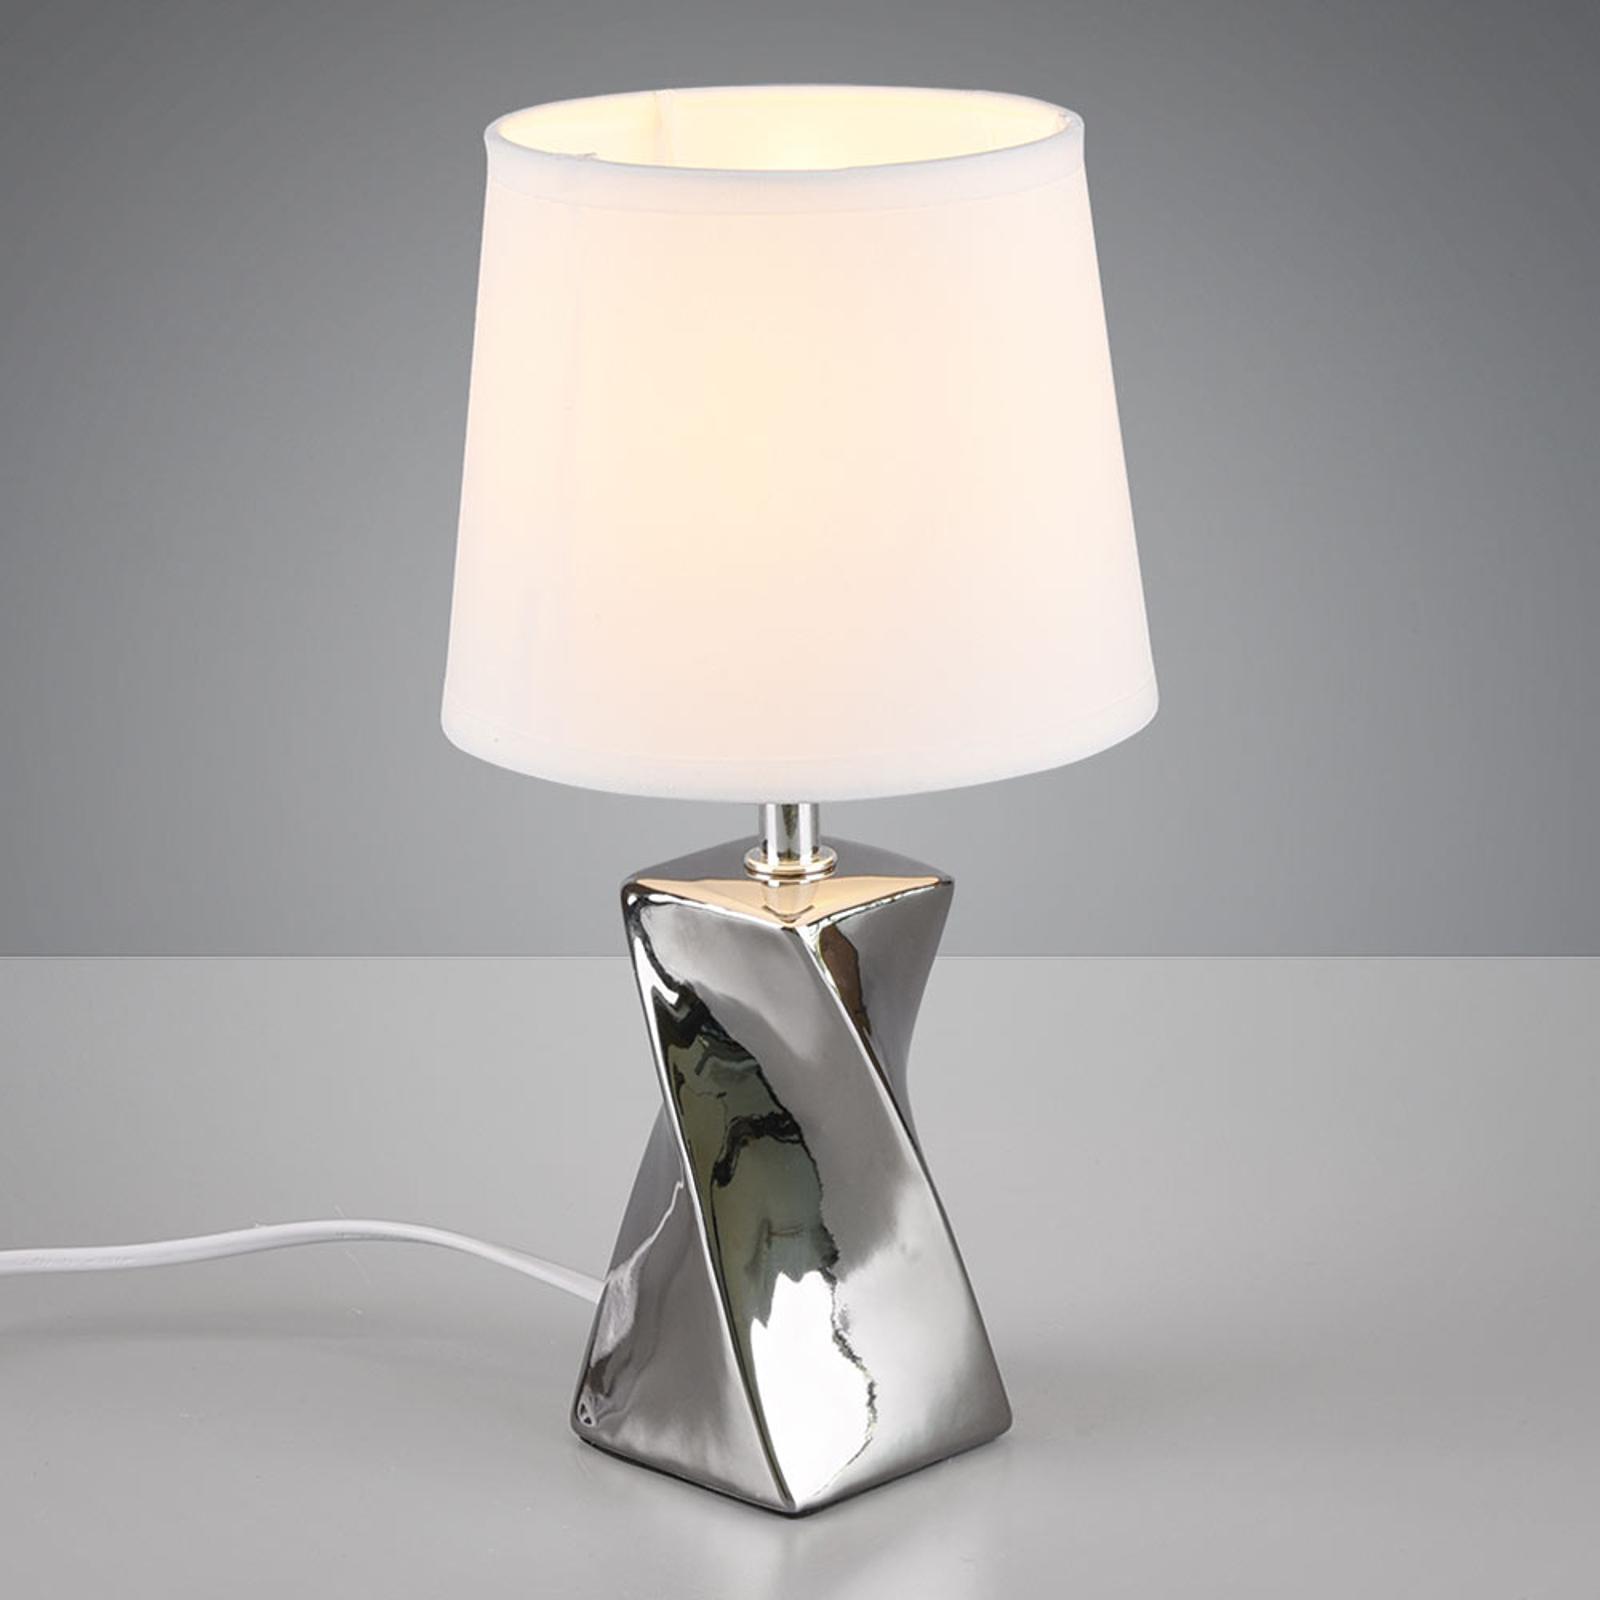 Tafellamp Abeba, Ø 15 cm, wit-zilver